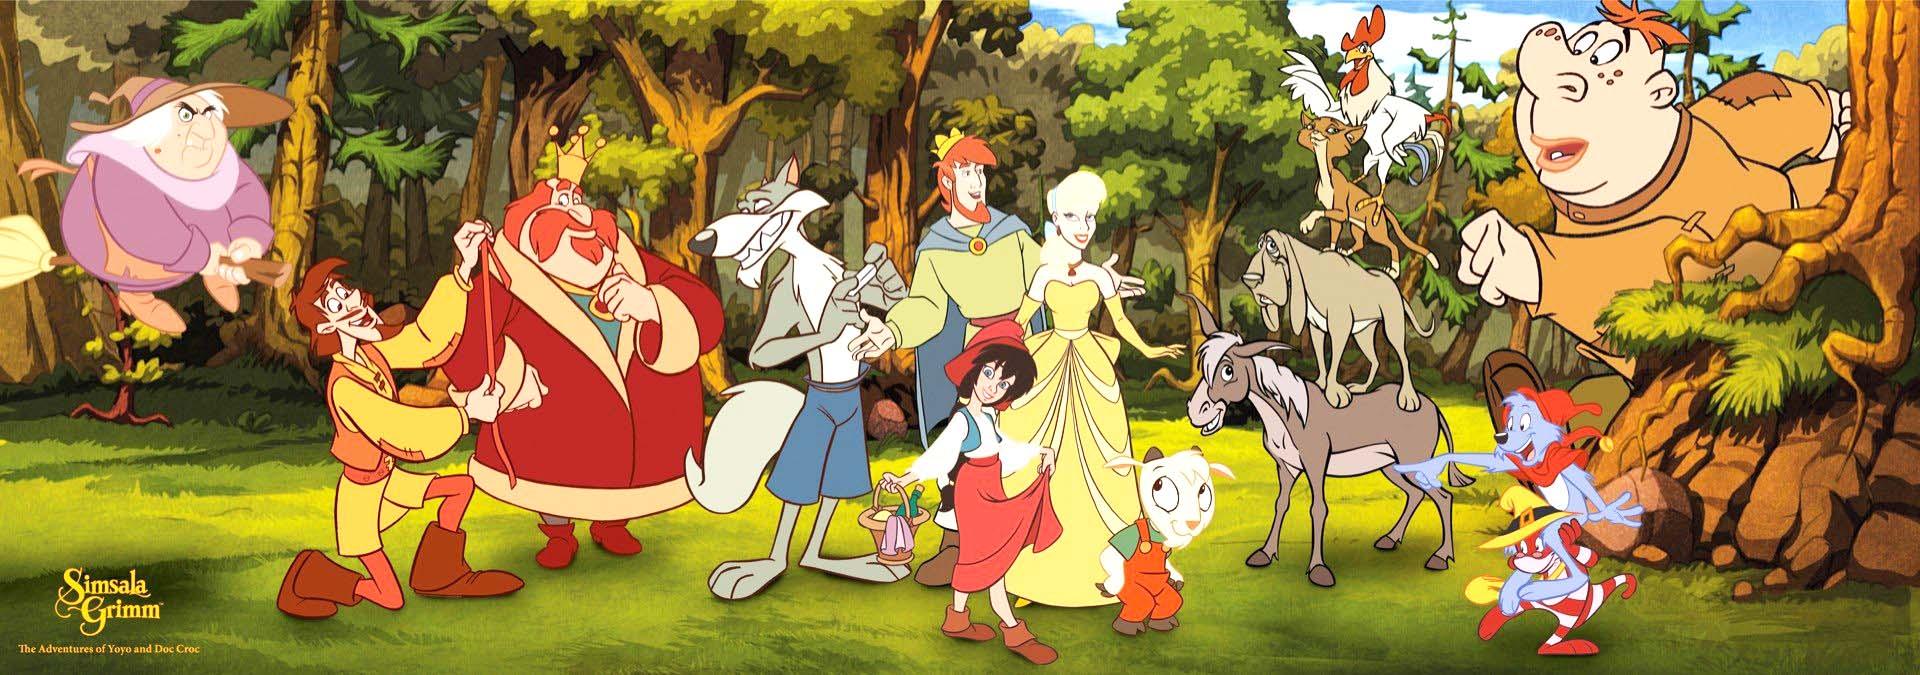 Simsala Grimm, desene animate Minimax, Povești Frații Grimm